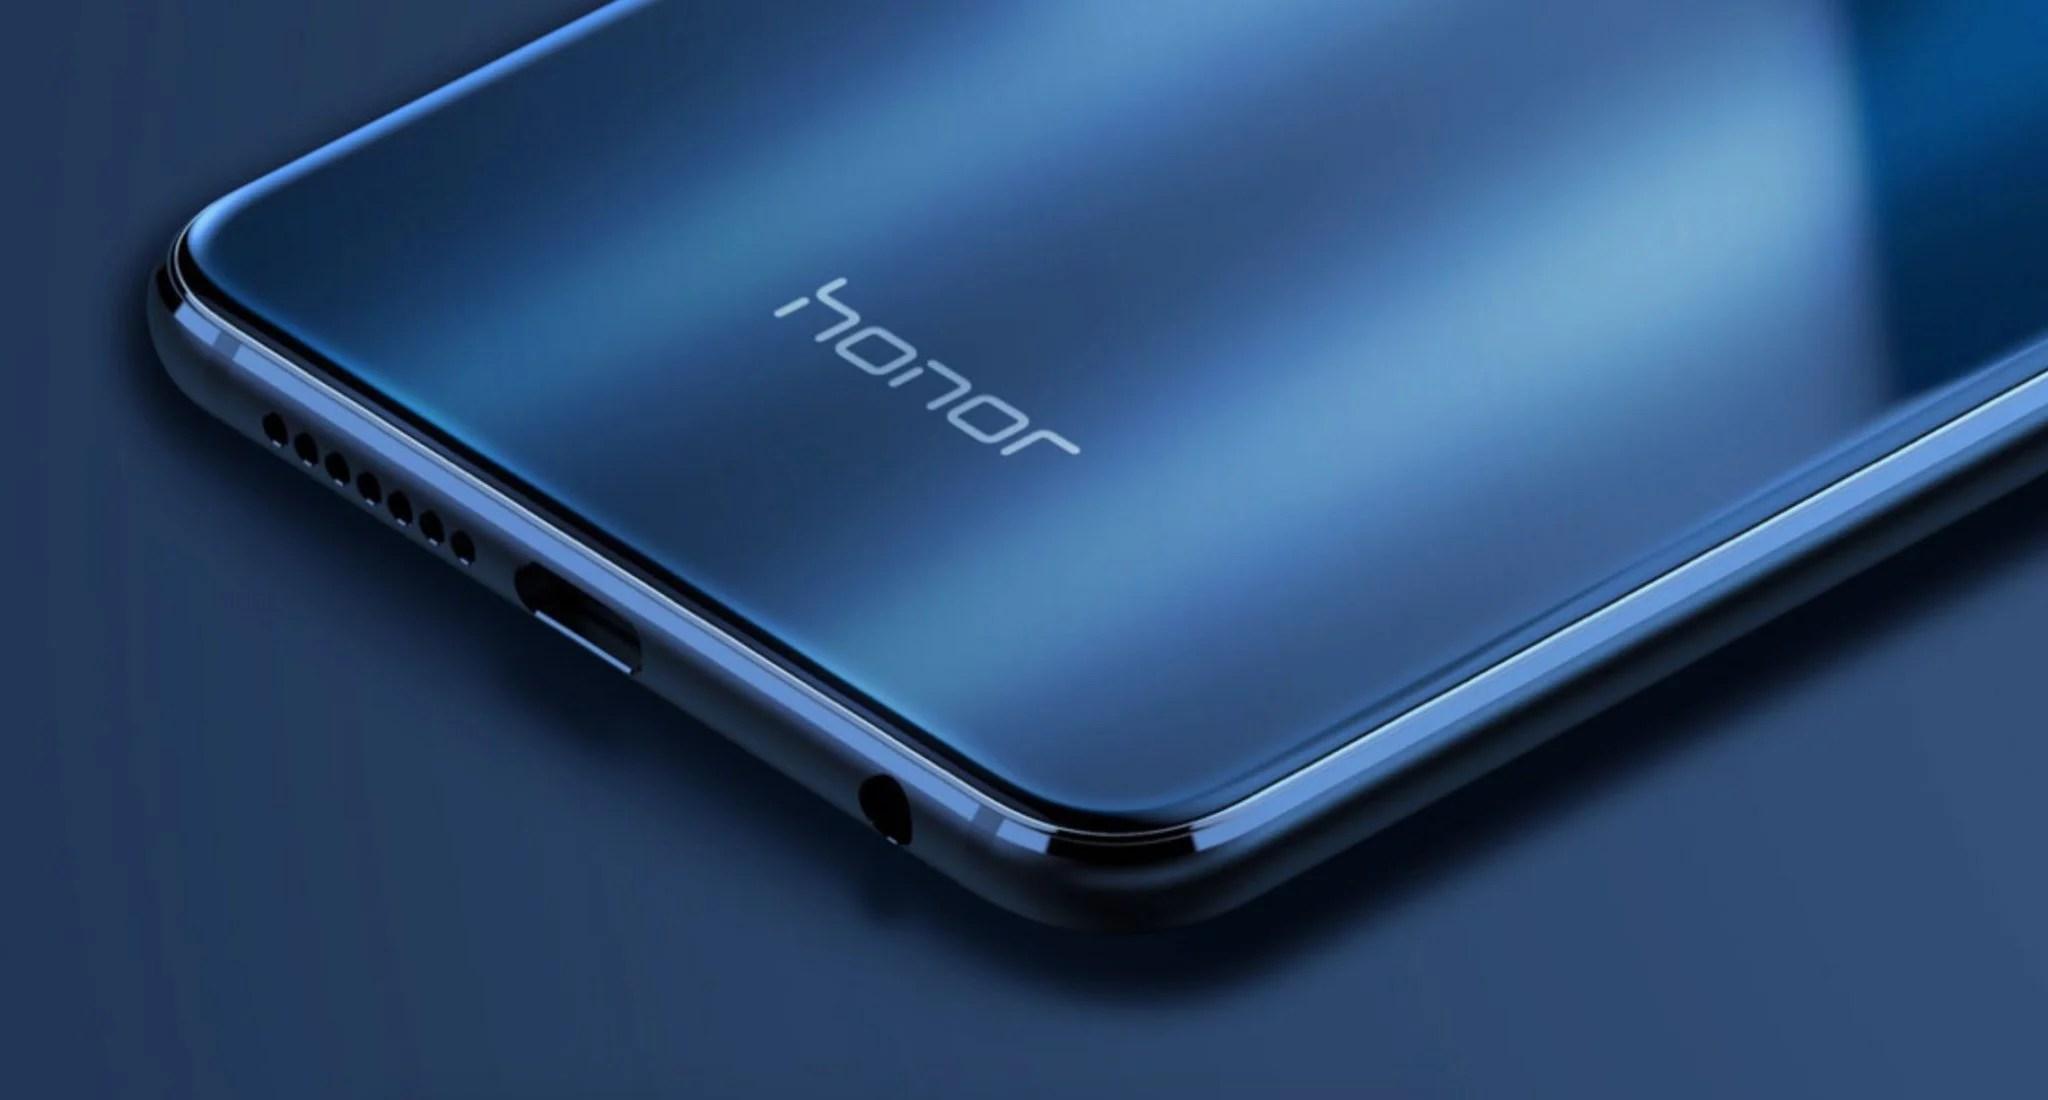 C'est officiel, Huawei a revendu sa marque Honor